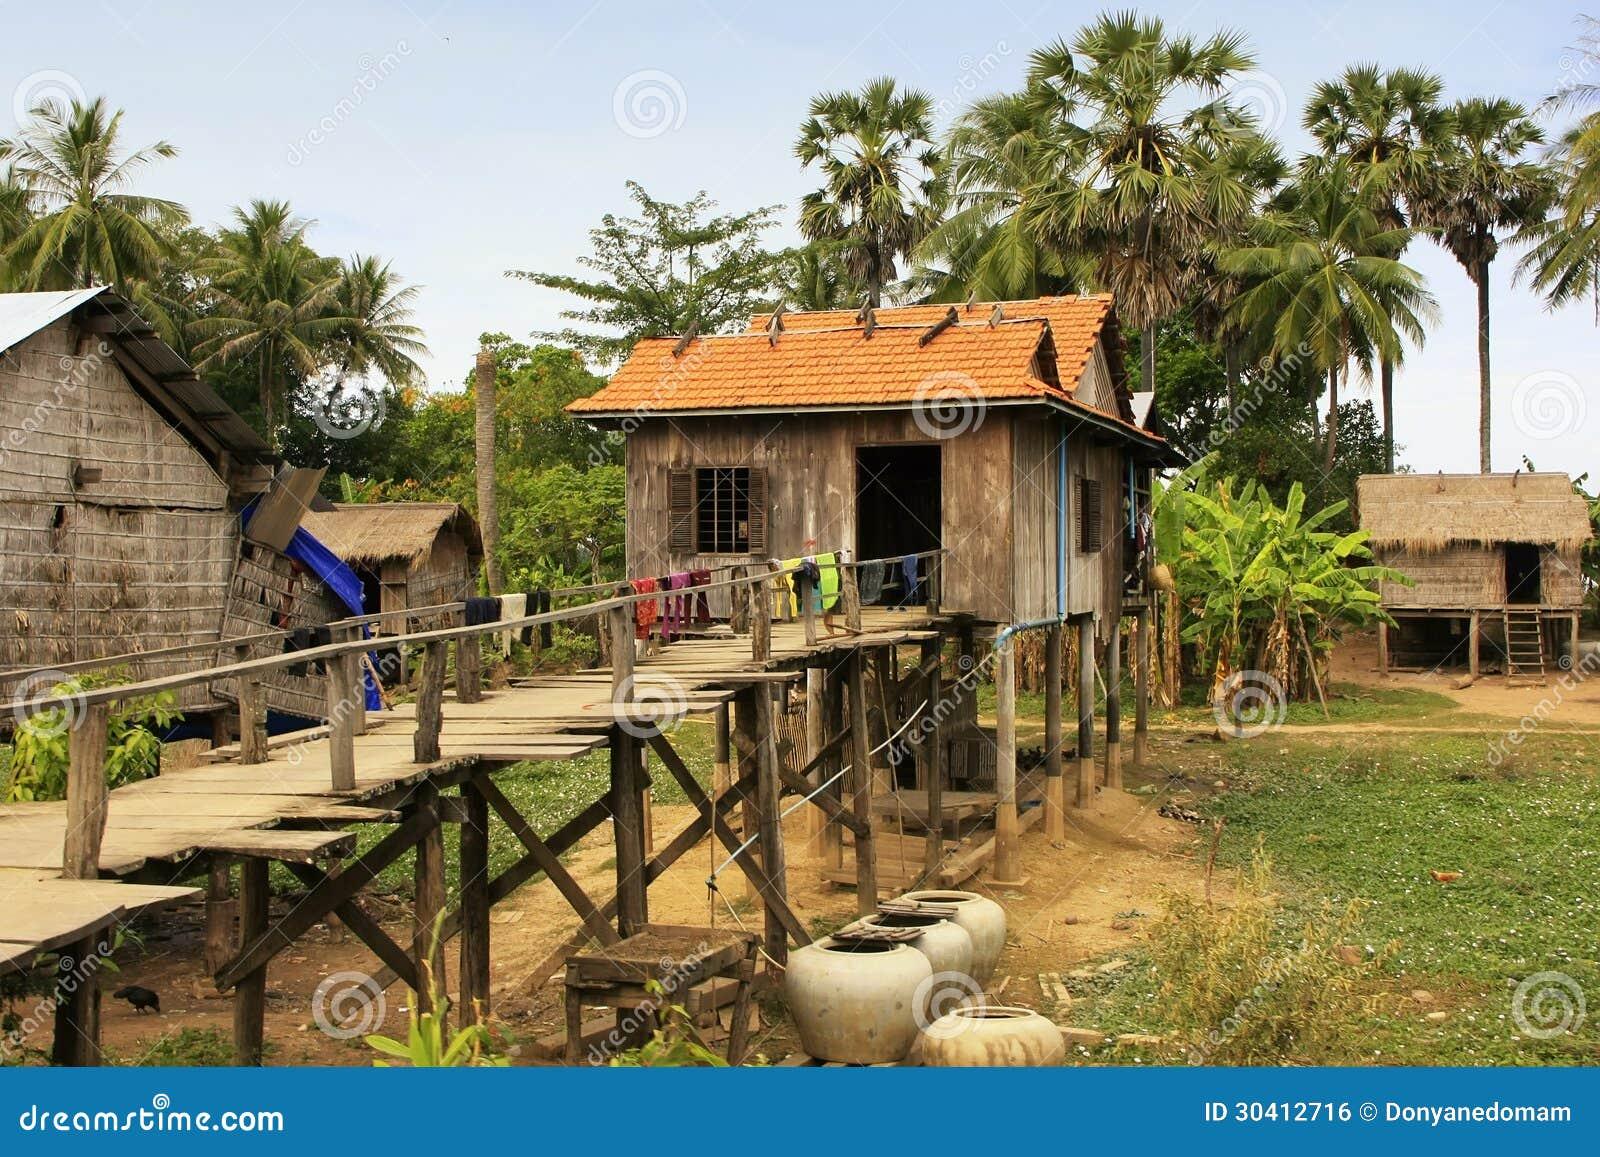 Bahay Kubo Design Stilt Houses In A Small Village Near Kratie Cambodia